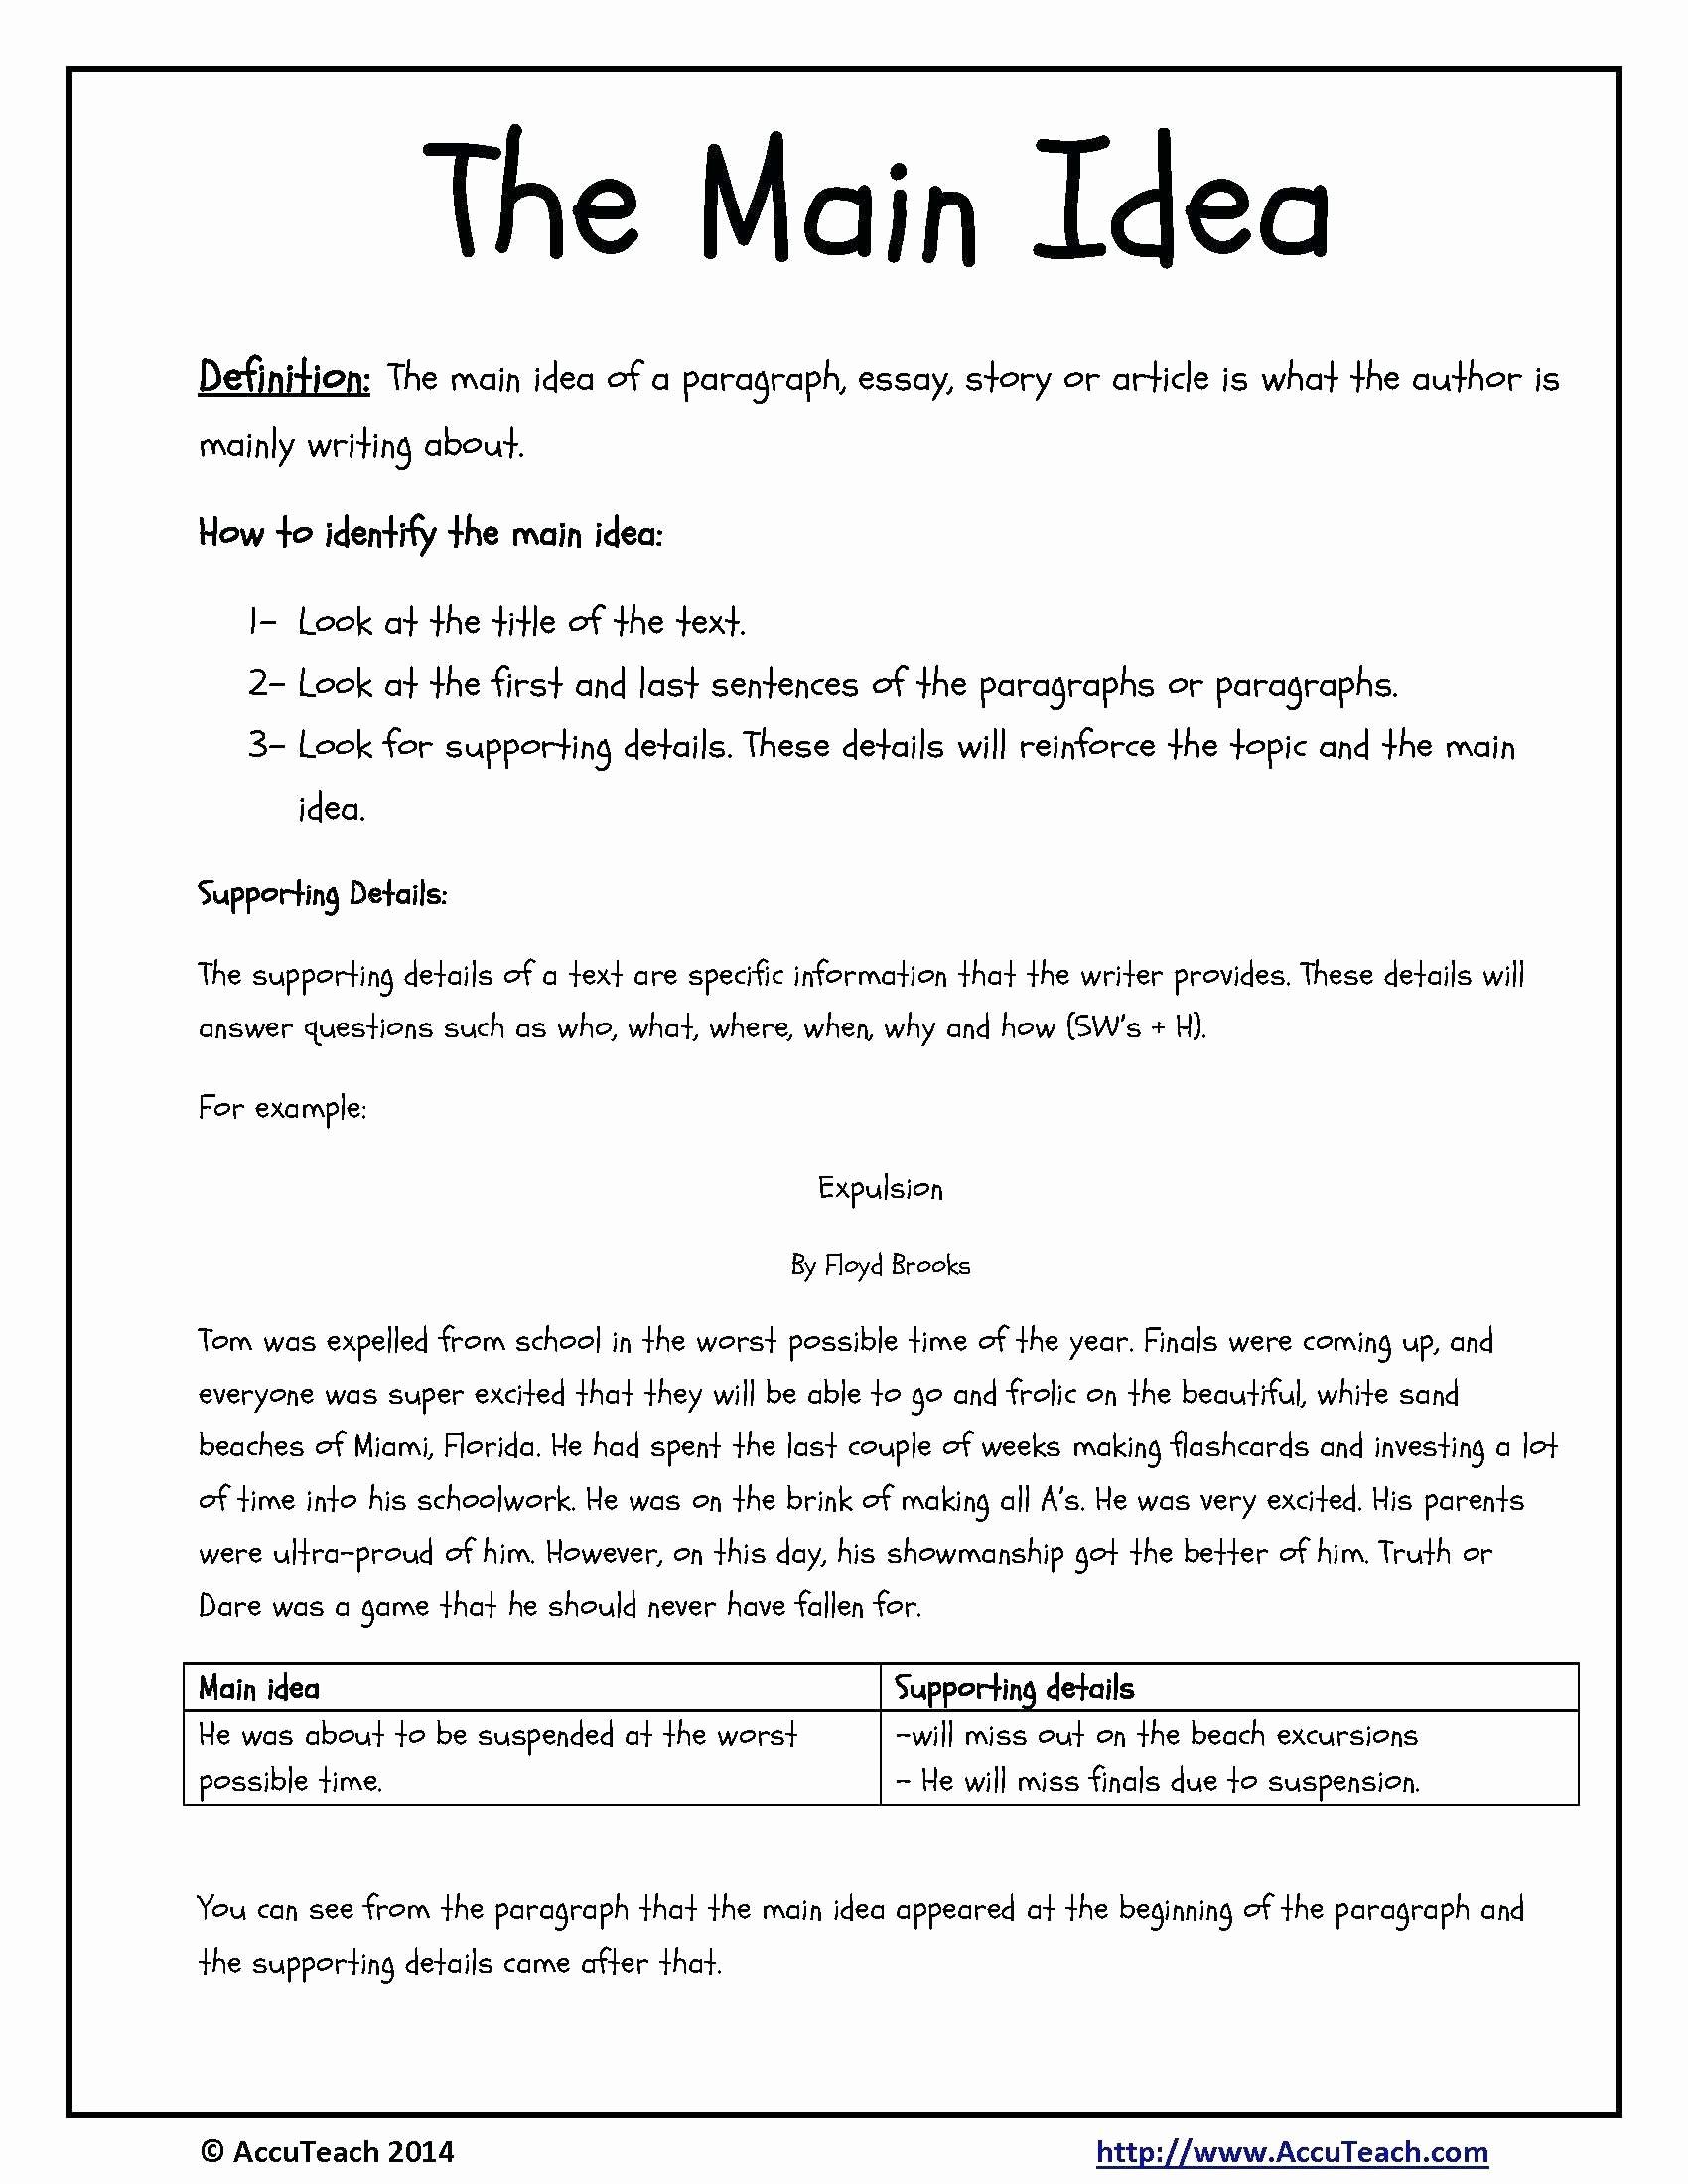 Main Idea and Details Worksheet Luxury 10 attractive Main Idea and Details Worksheets 3rd Grade 2020